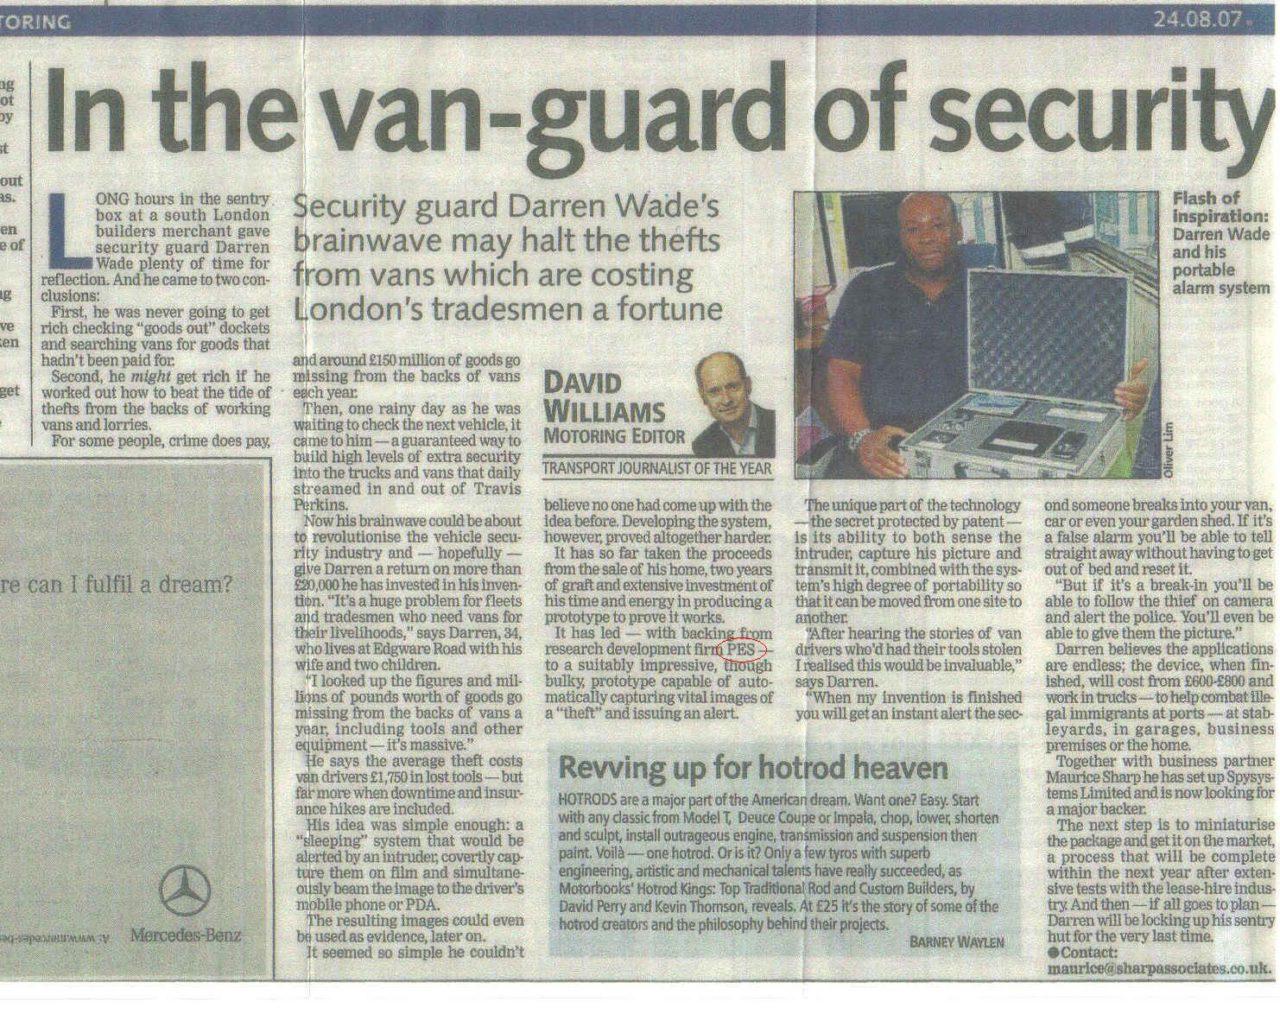 RoadSpy Evening Standard Article 24 8 07